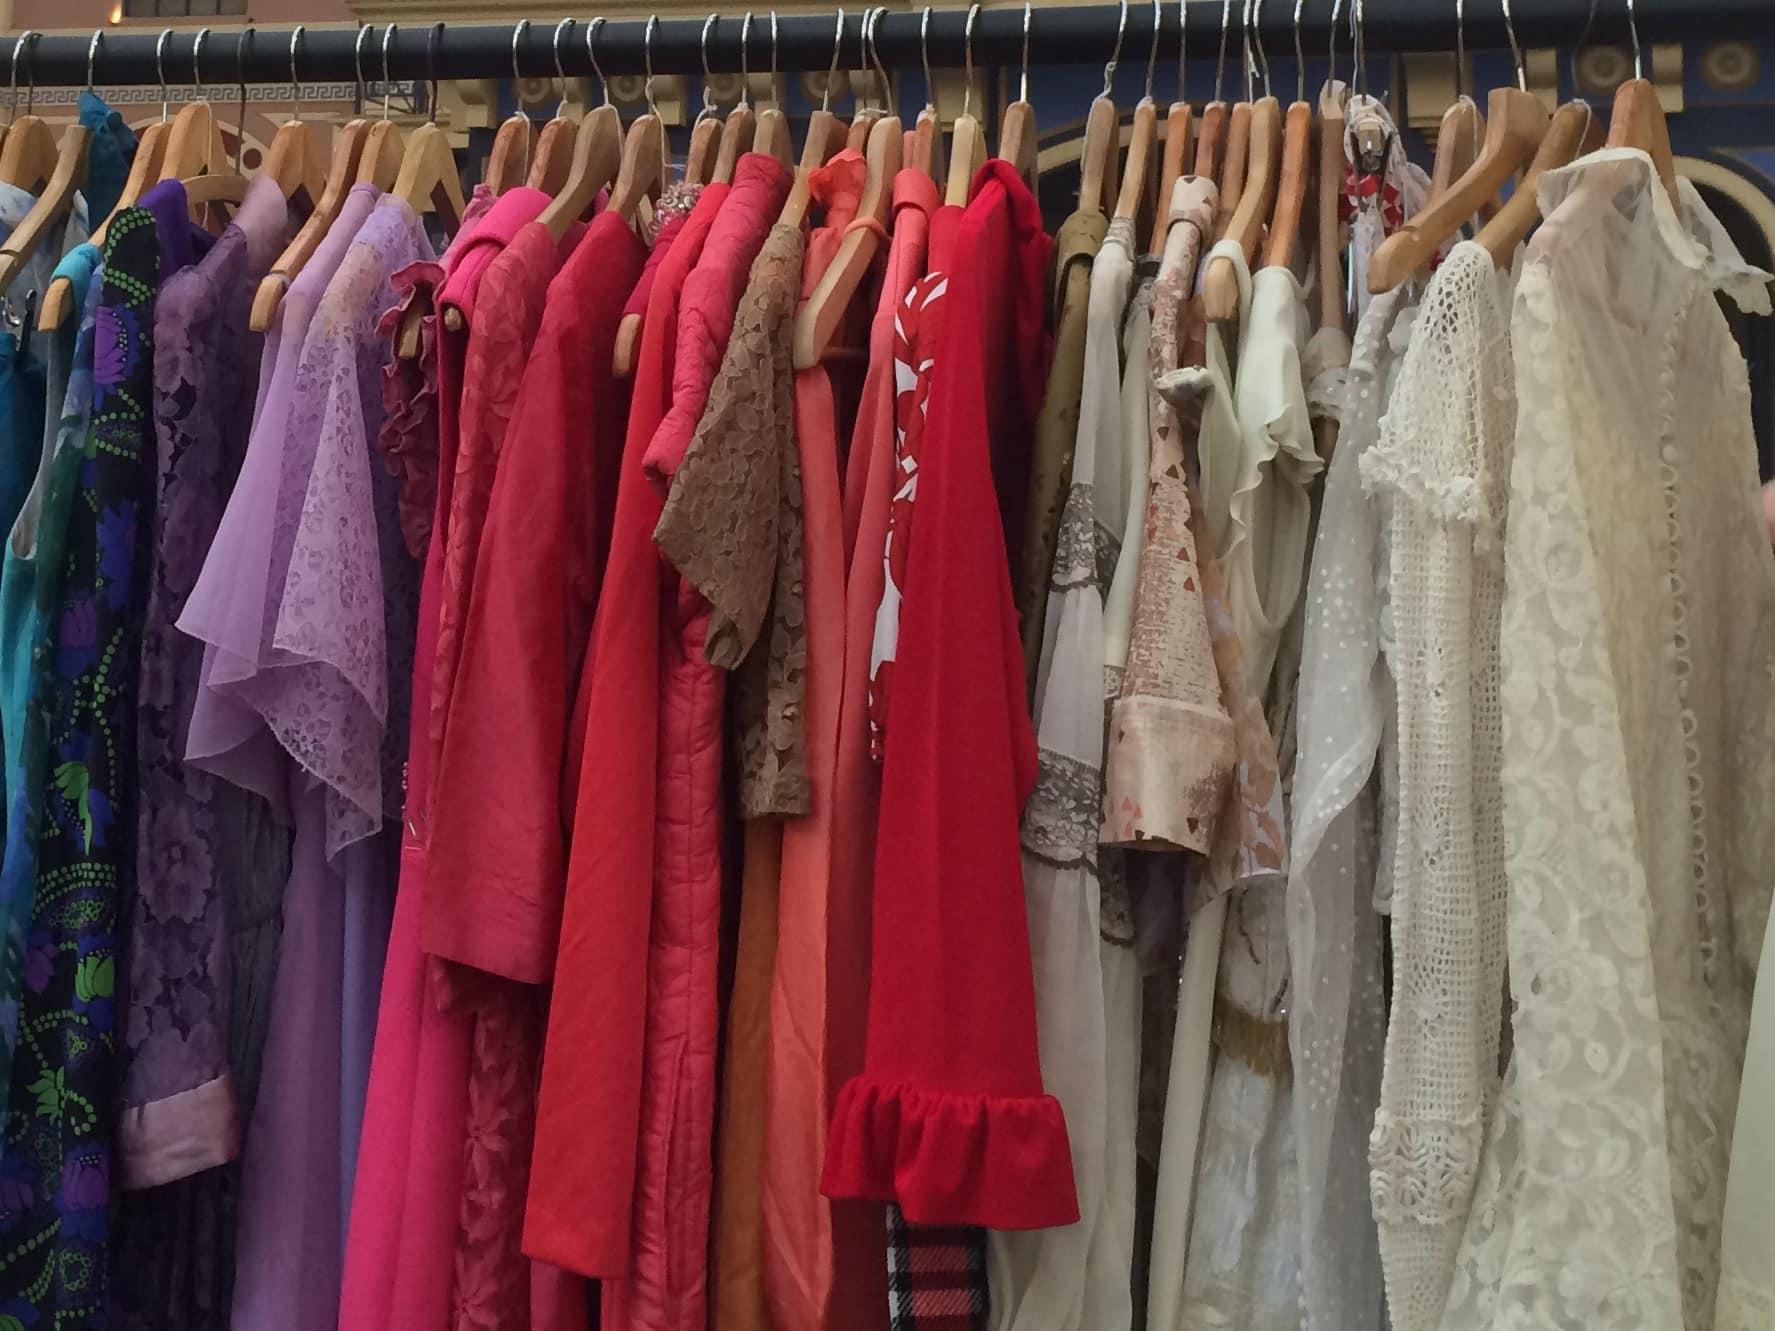 Pop Up Vintage Fashion & Homeware Event